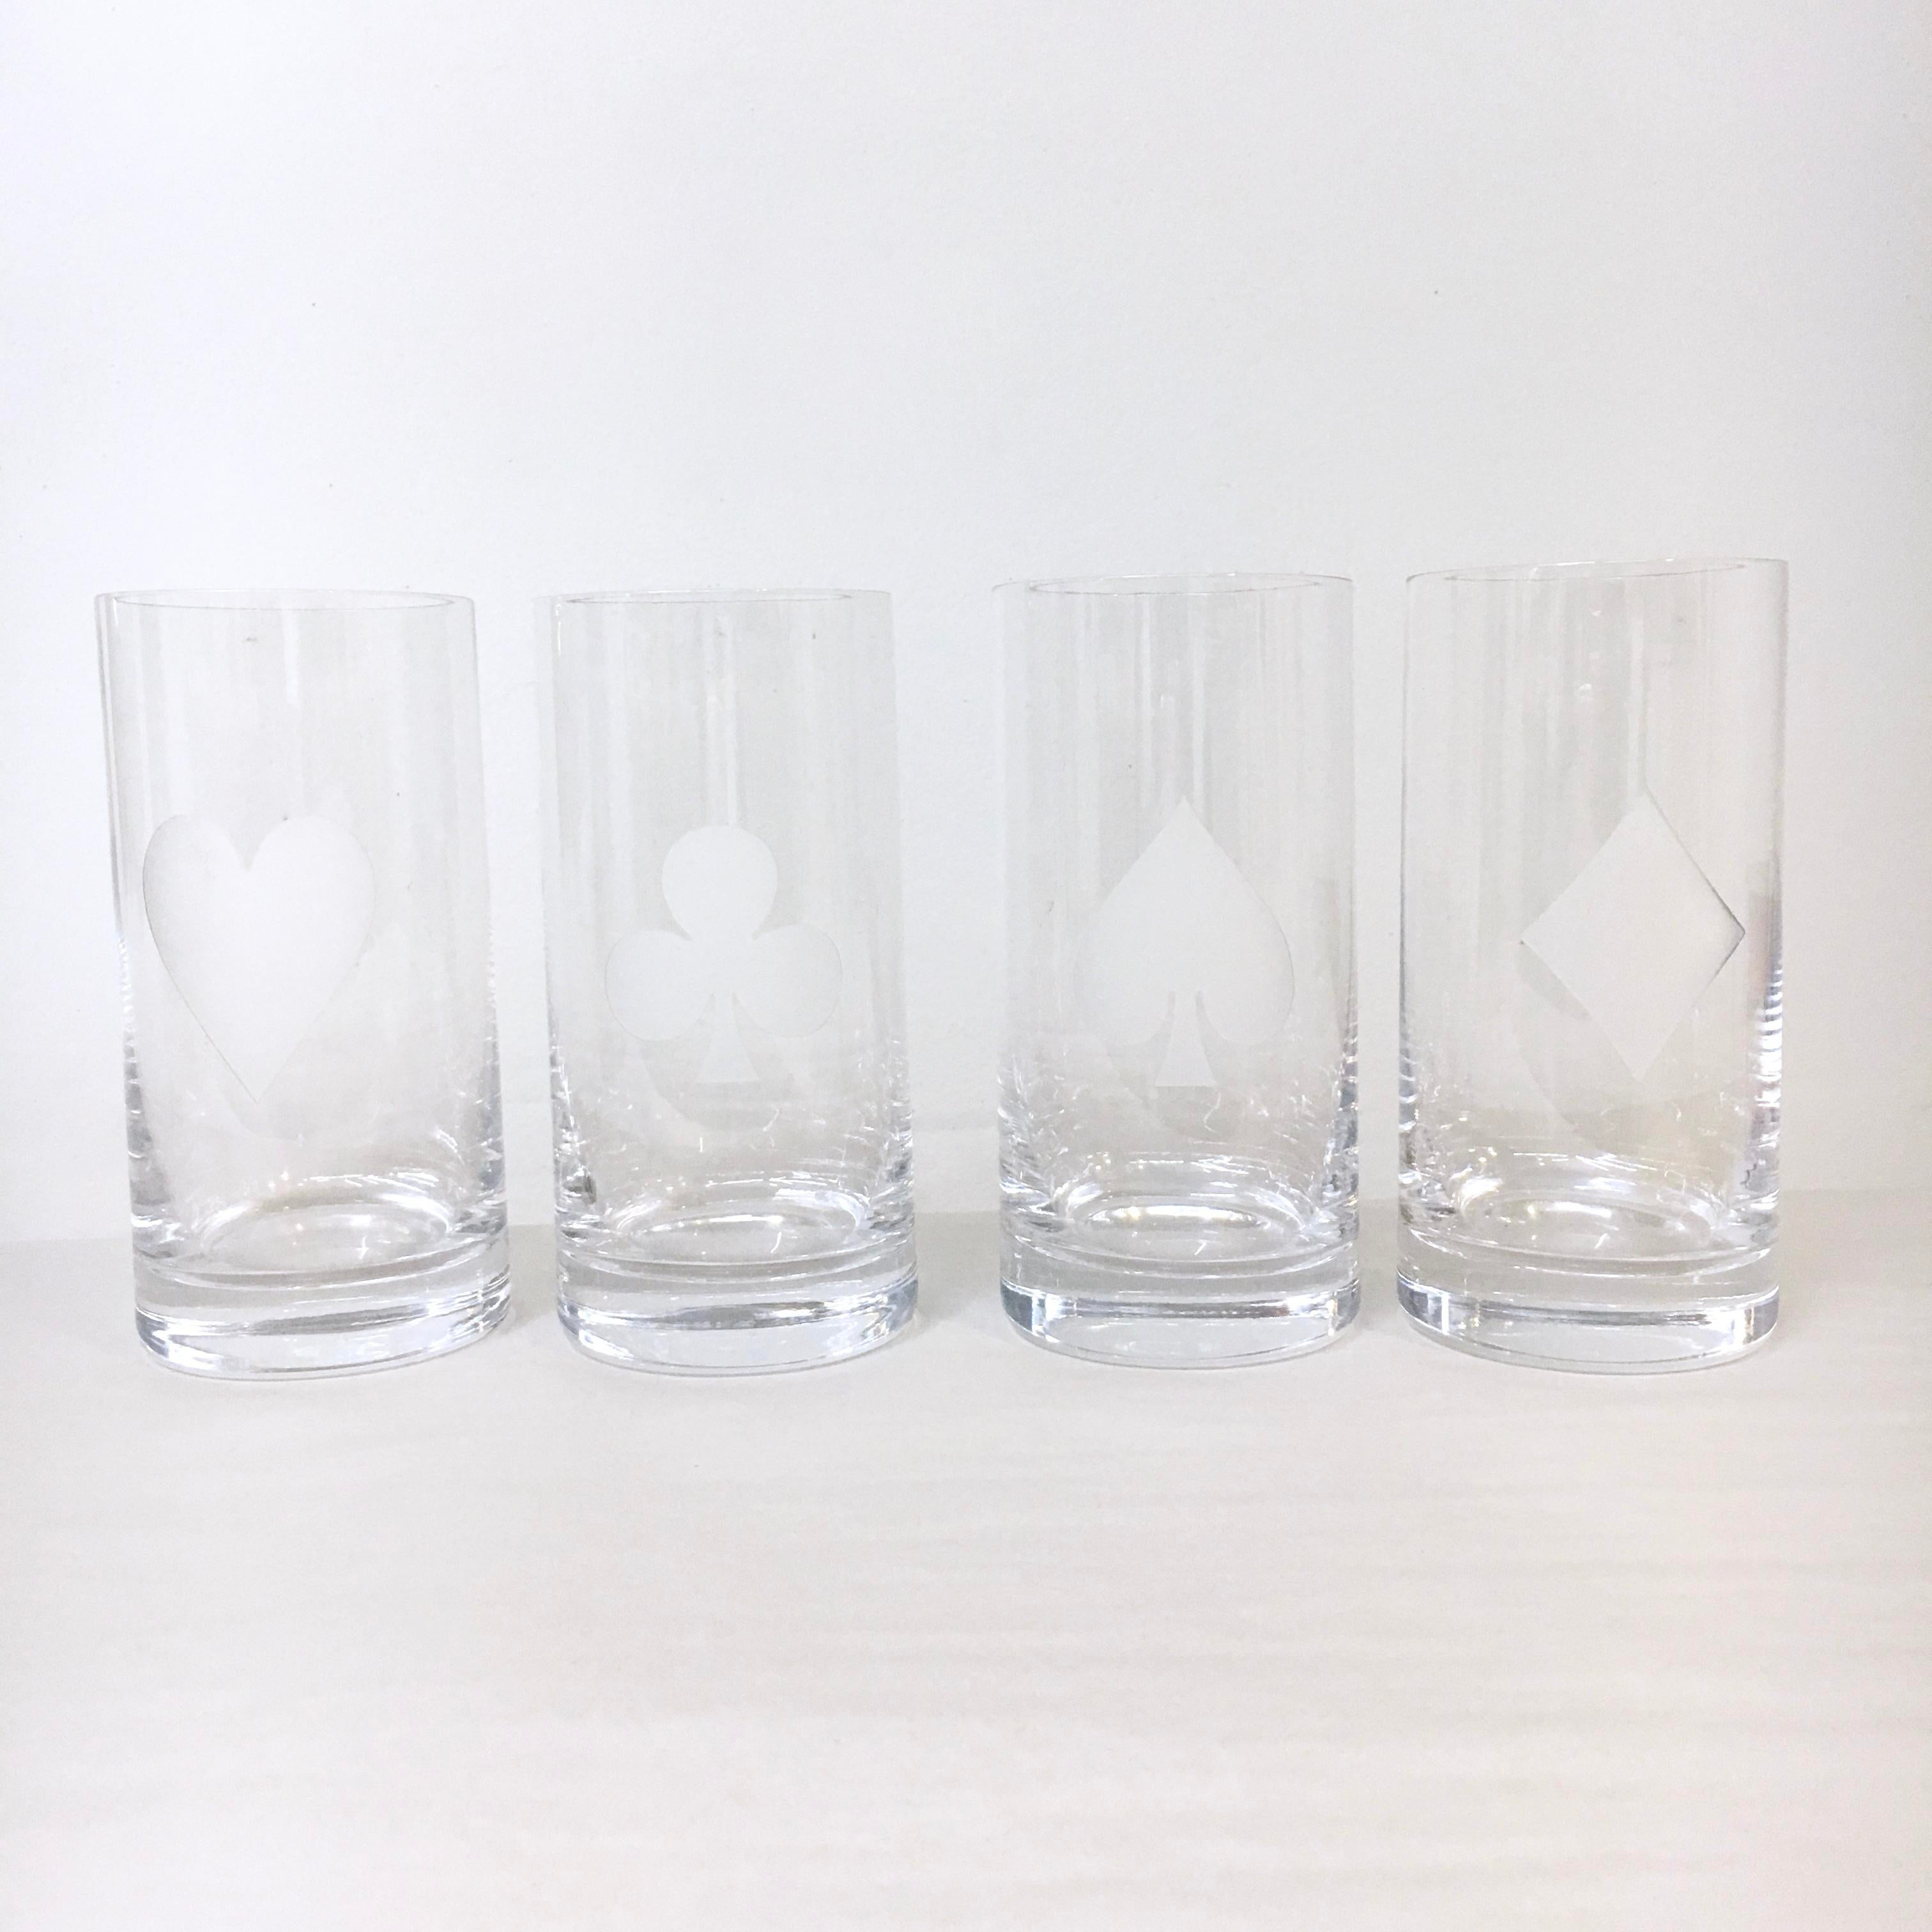 Good Kate Spade U0027Gin Rummyu0027 Crystal Barware   Set Of 8   Image ...